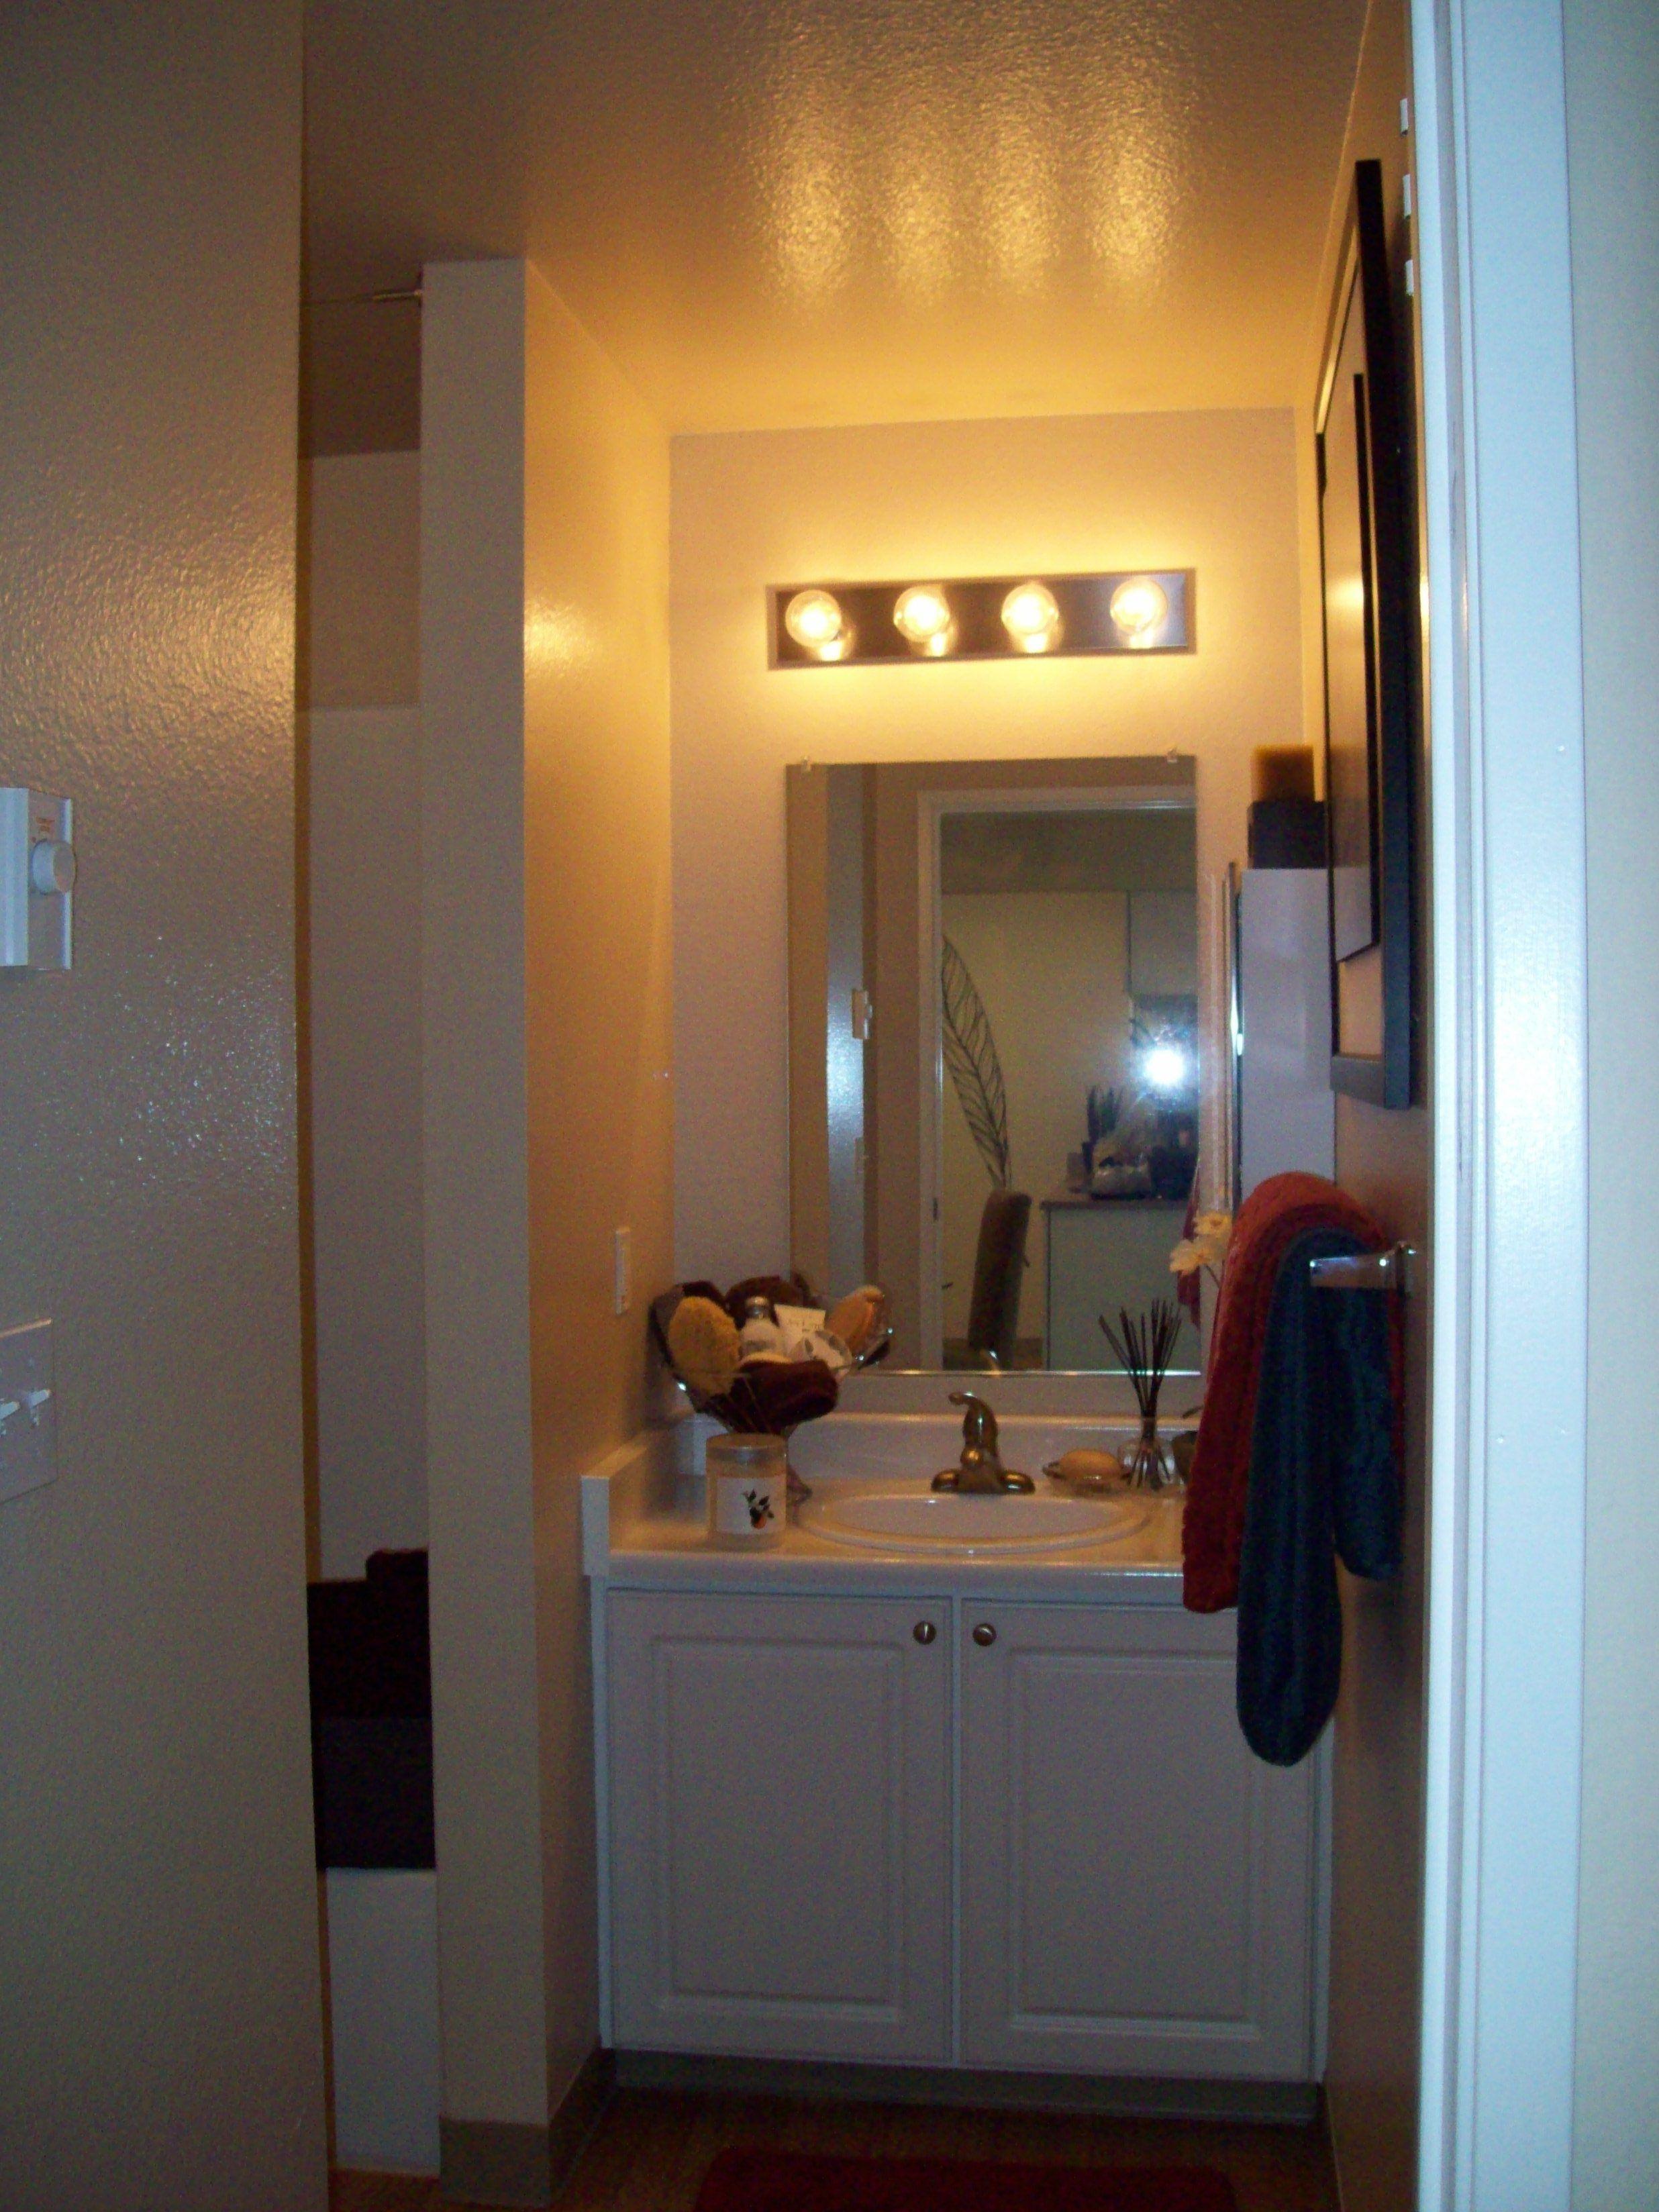 Cascade Onebedroom, One Bath 644 sq. feet Bathroom